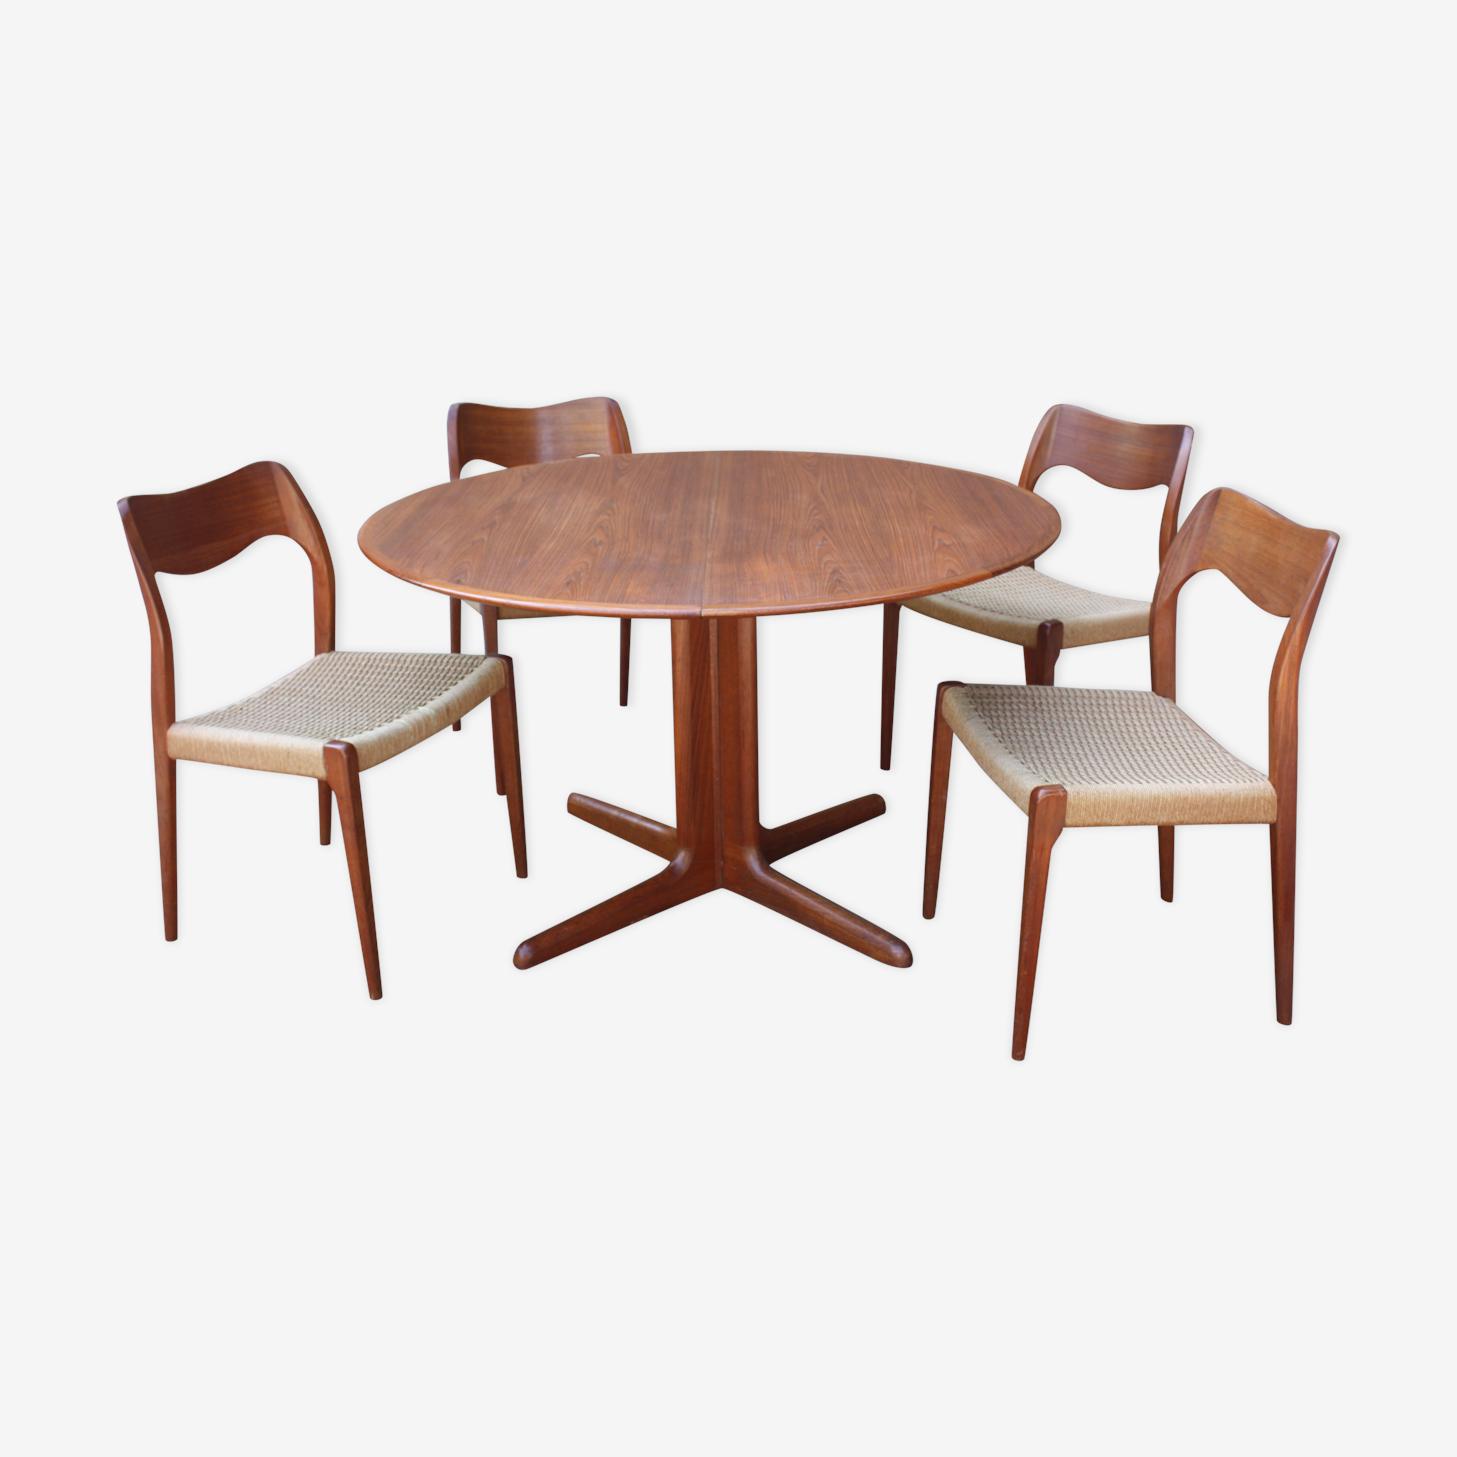 Table et 4 chaises Niels Otto Moller